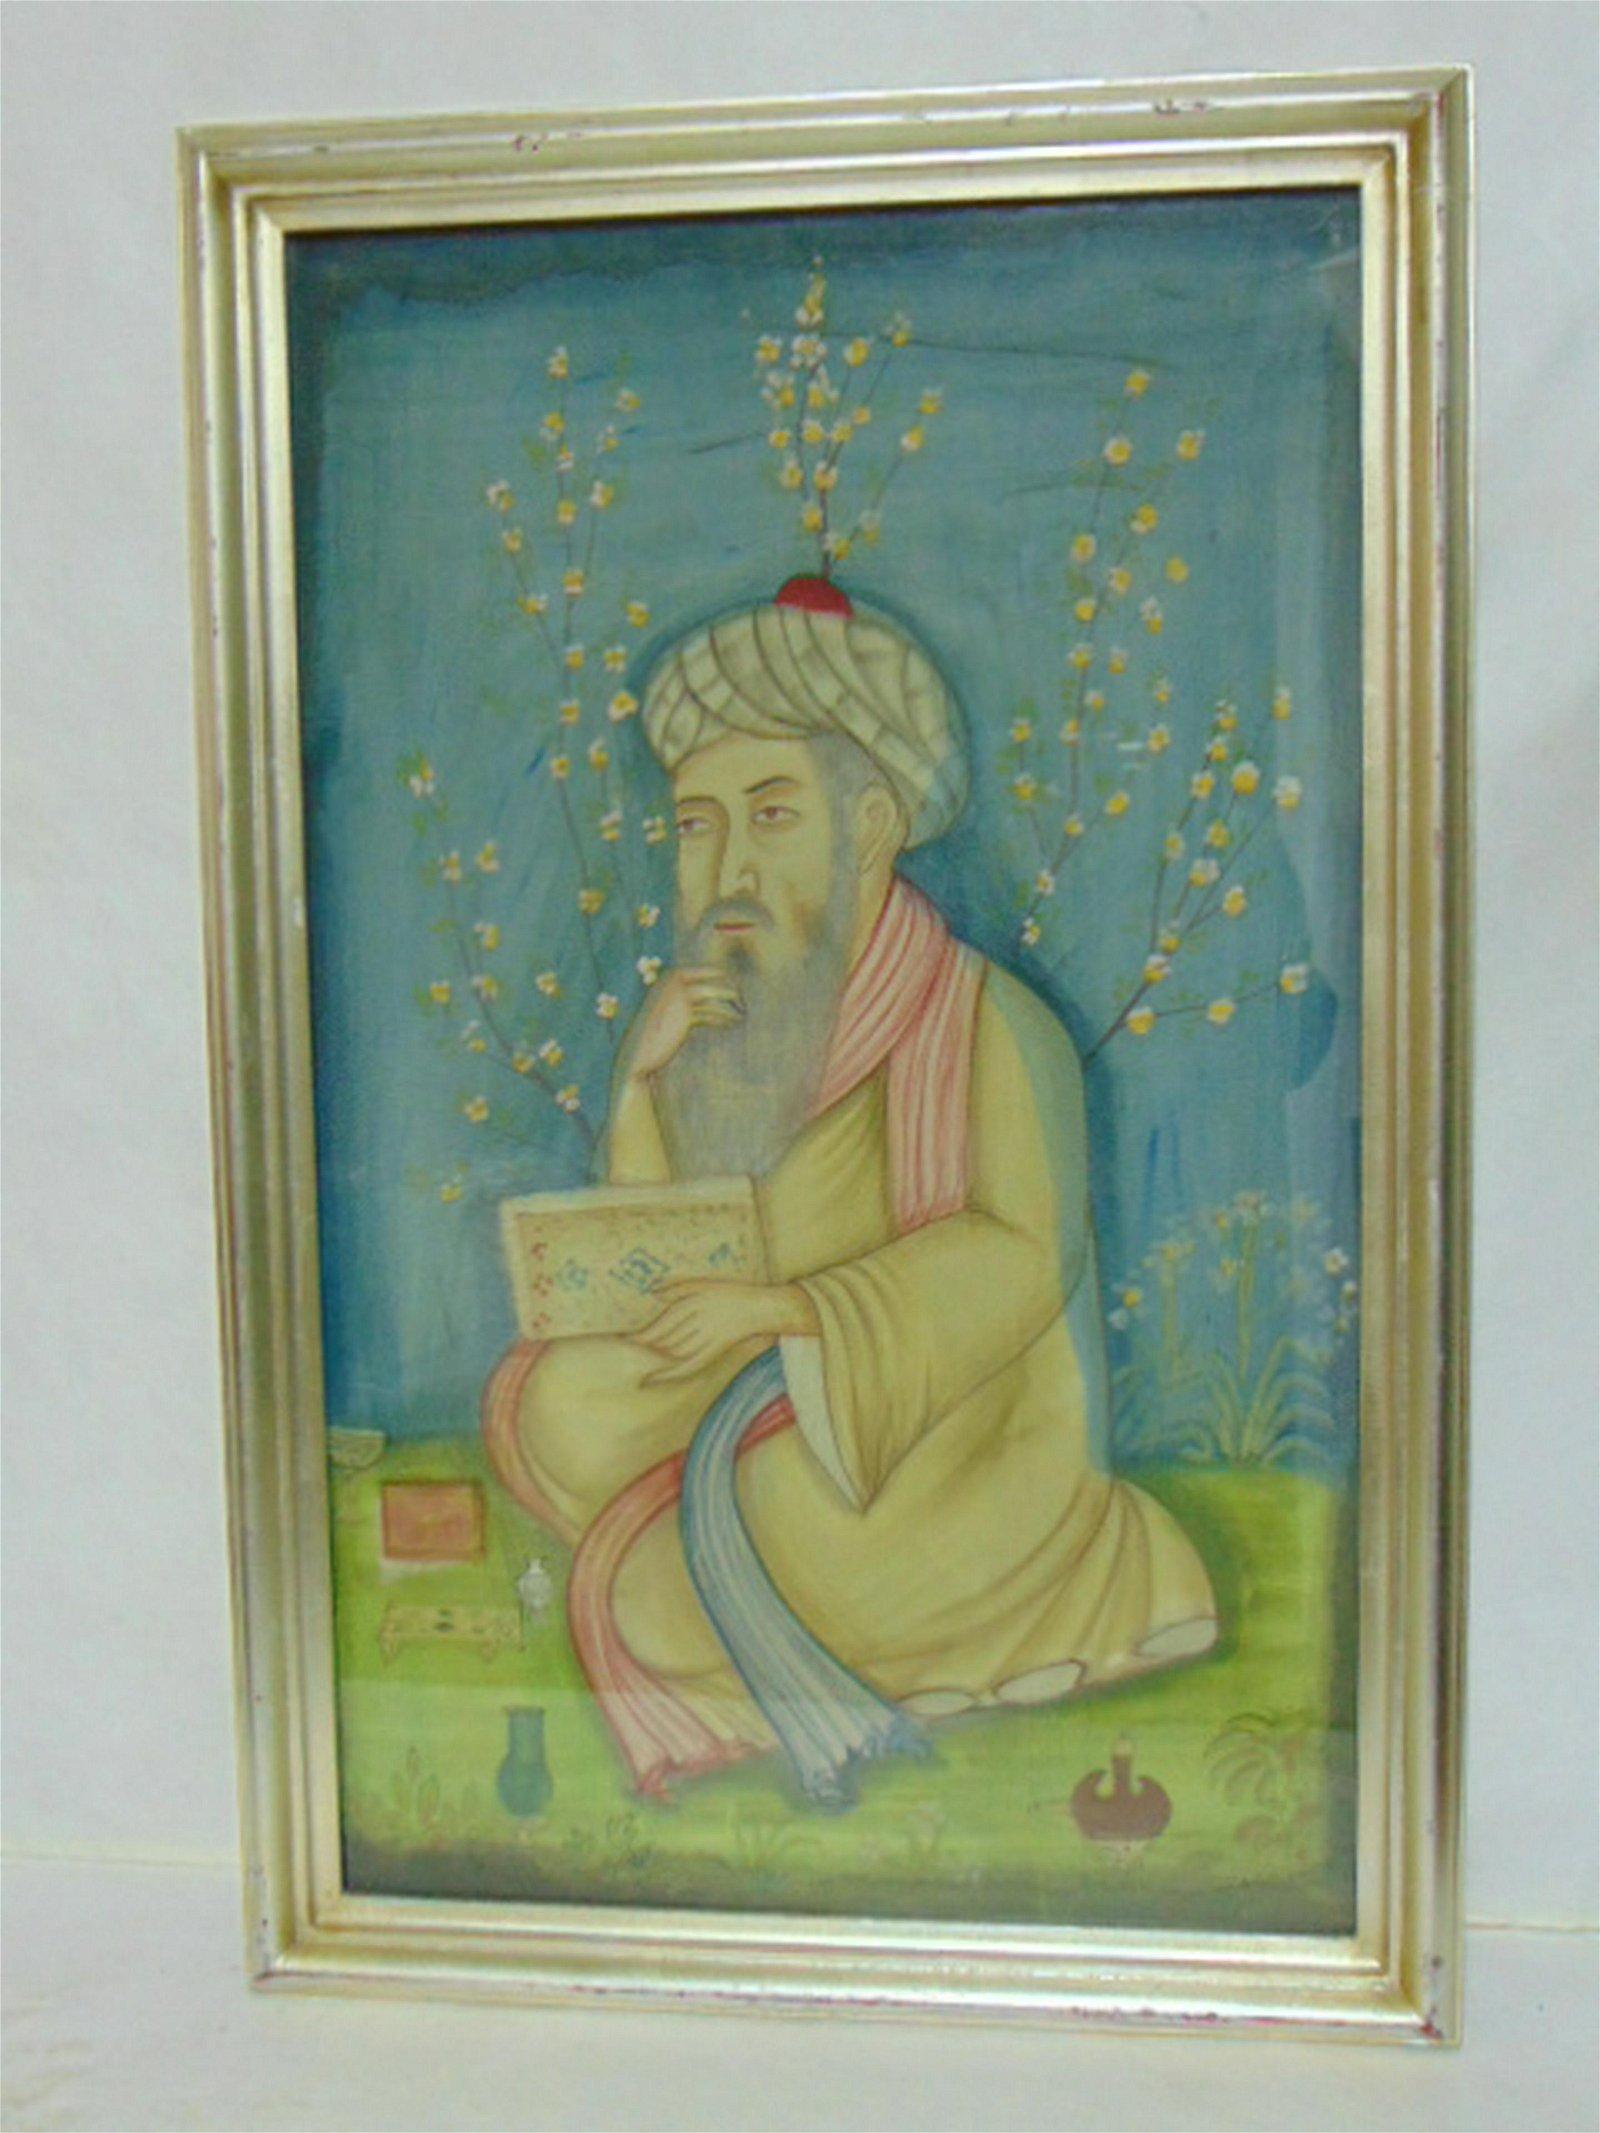 DECORATIVE VINTAGE PERSIAN WATERCOLOR OMAR KHAYYAM